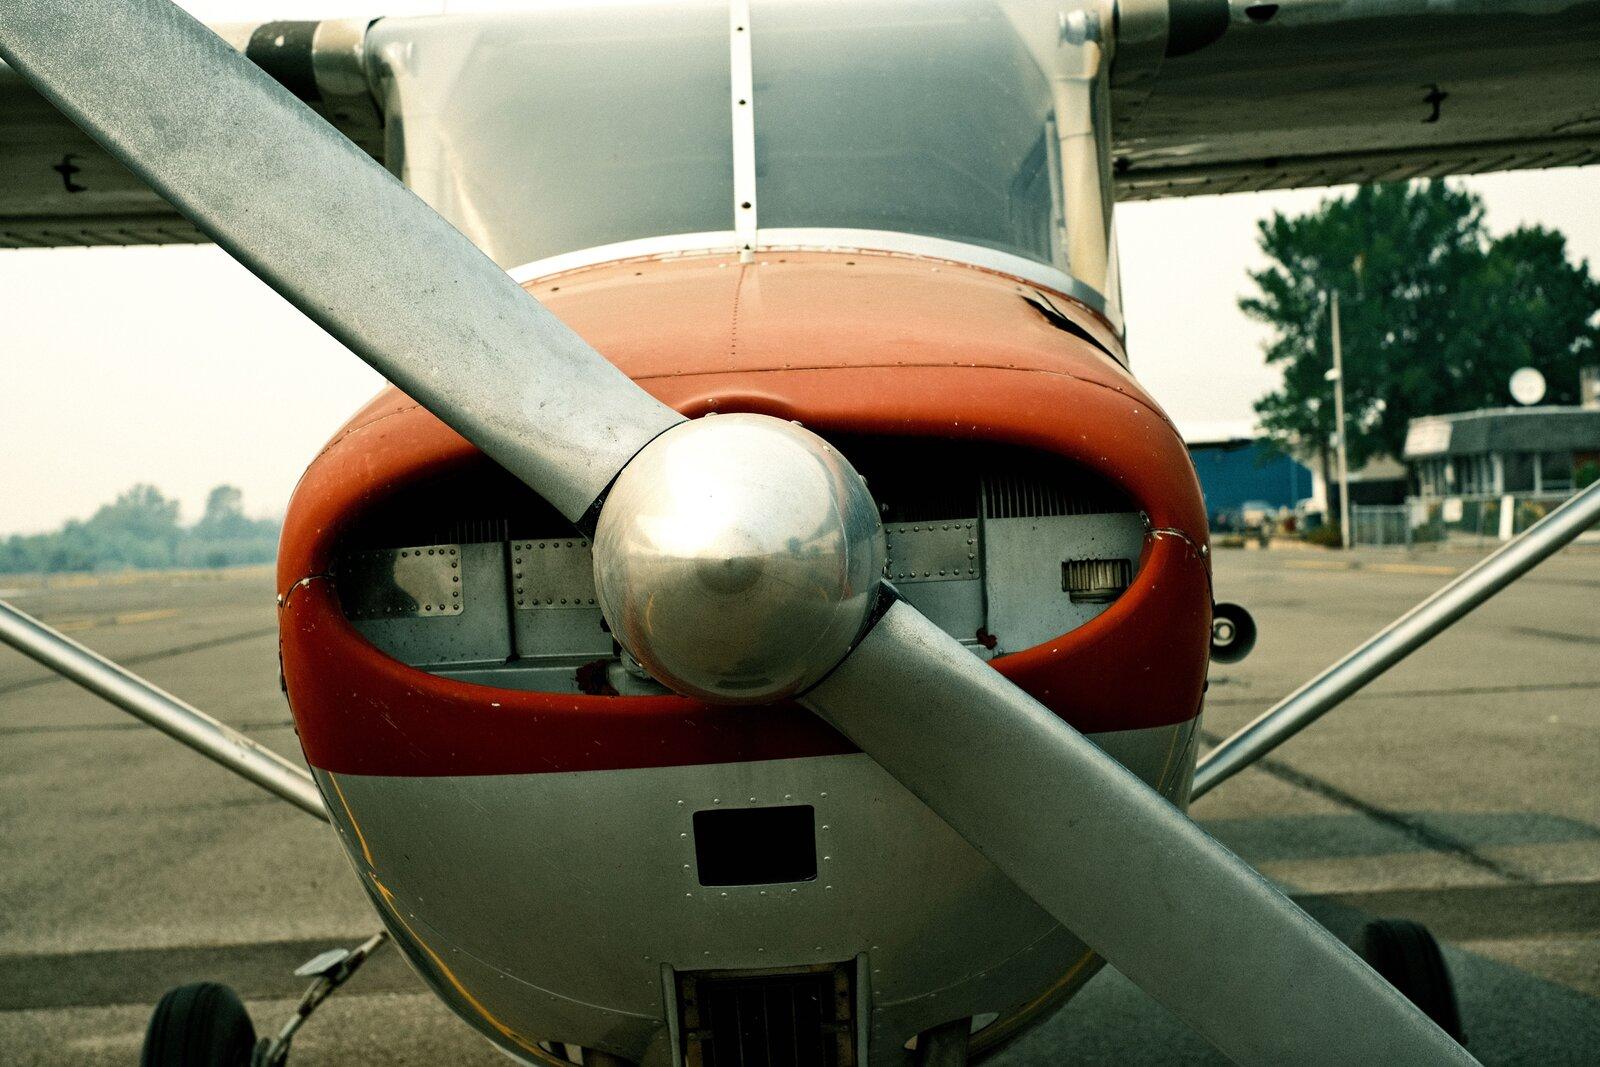 XPro3_Aug24_21_airplane_propeller.jpg